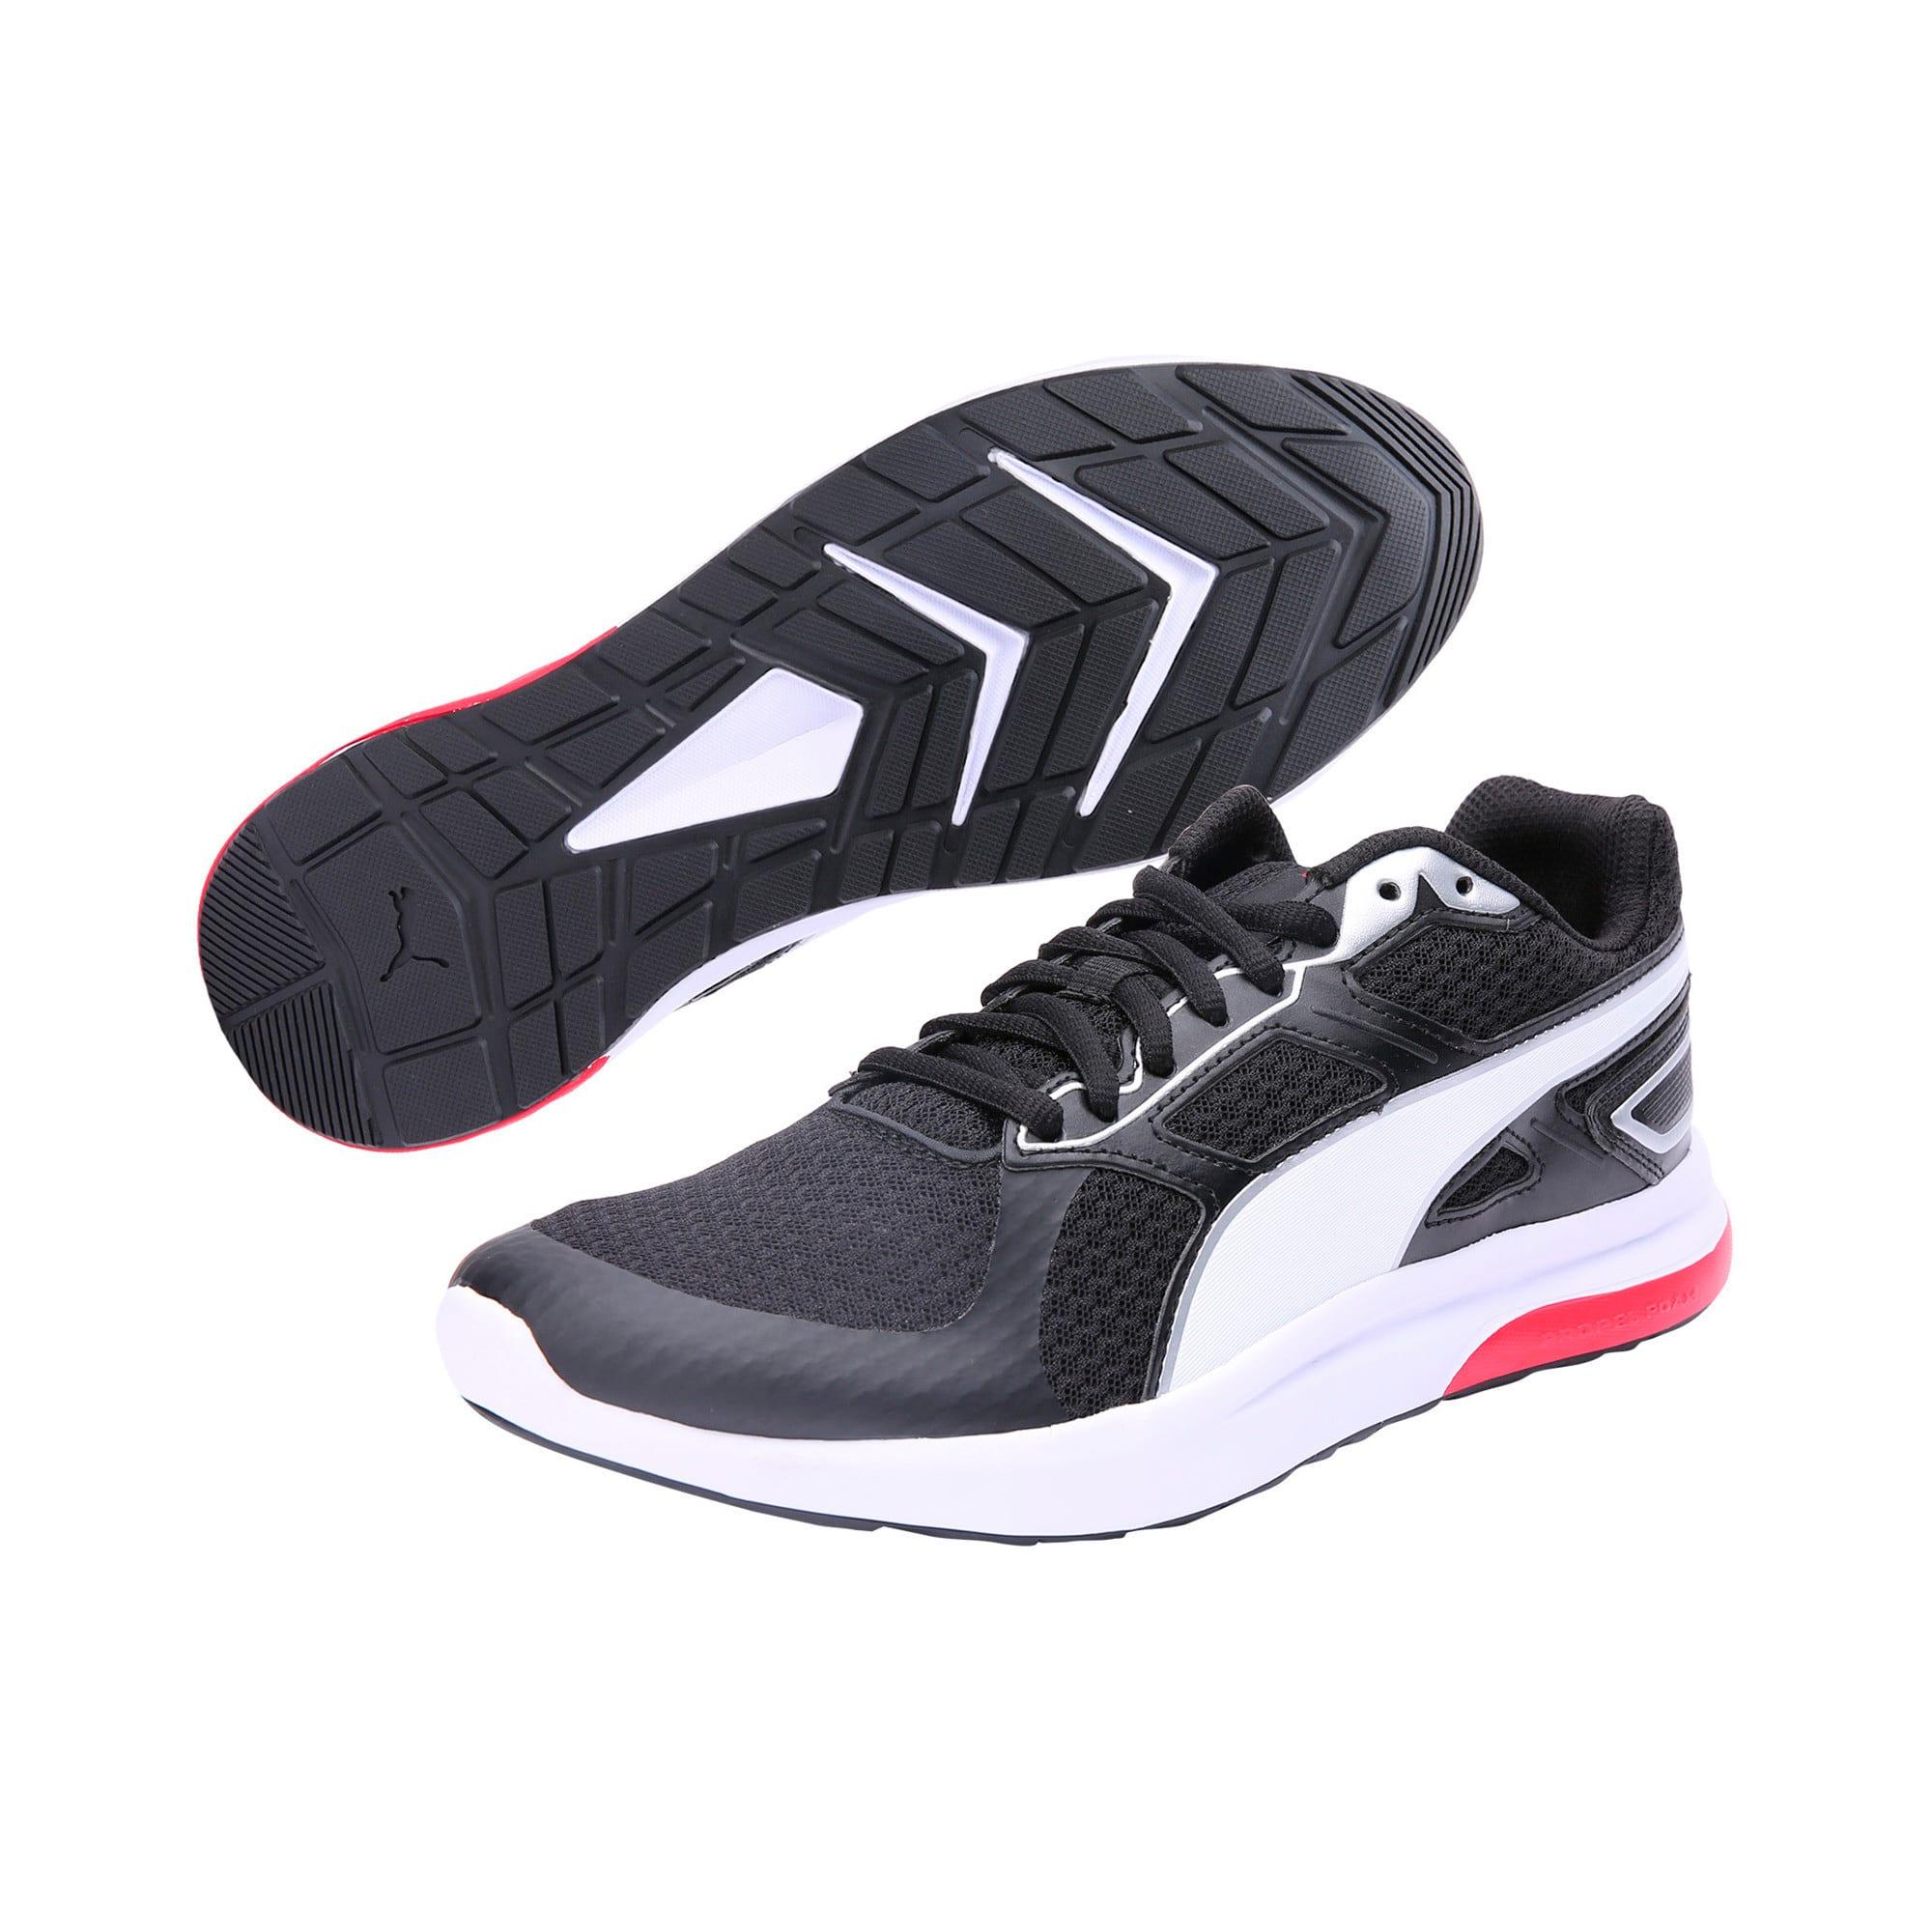 Thumbnail 2 of Escaper Tech Sneakers, P. Black-P. White-Fl.Scarlet, medium-IND